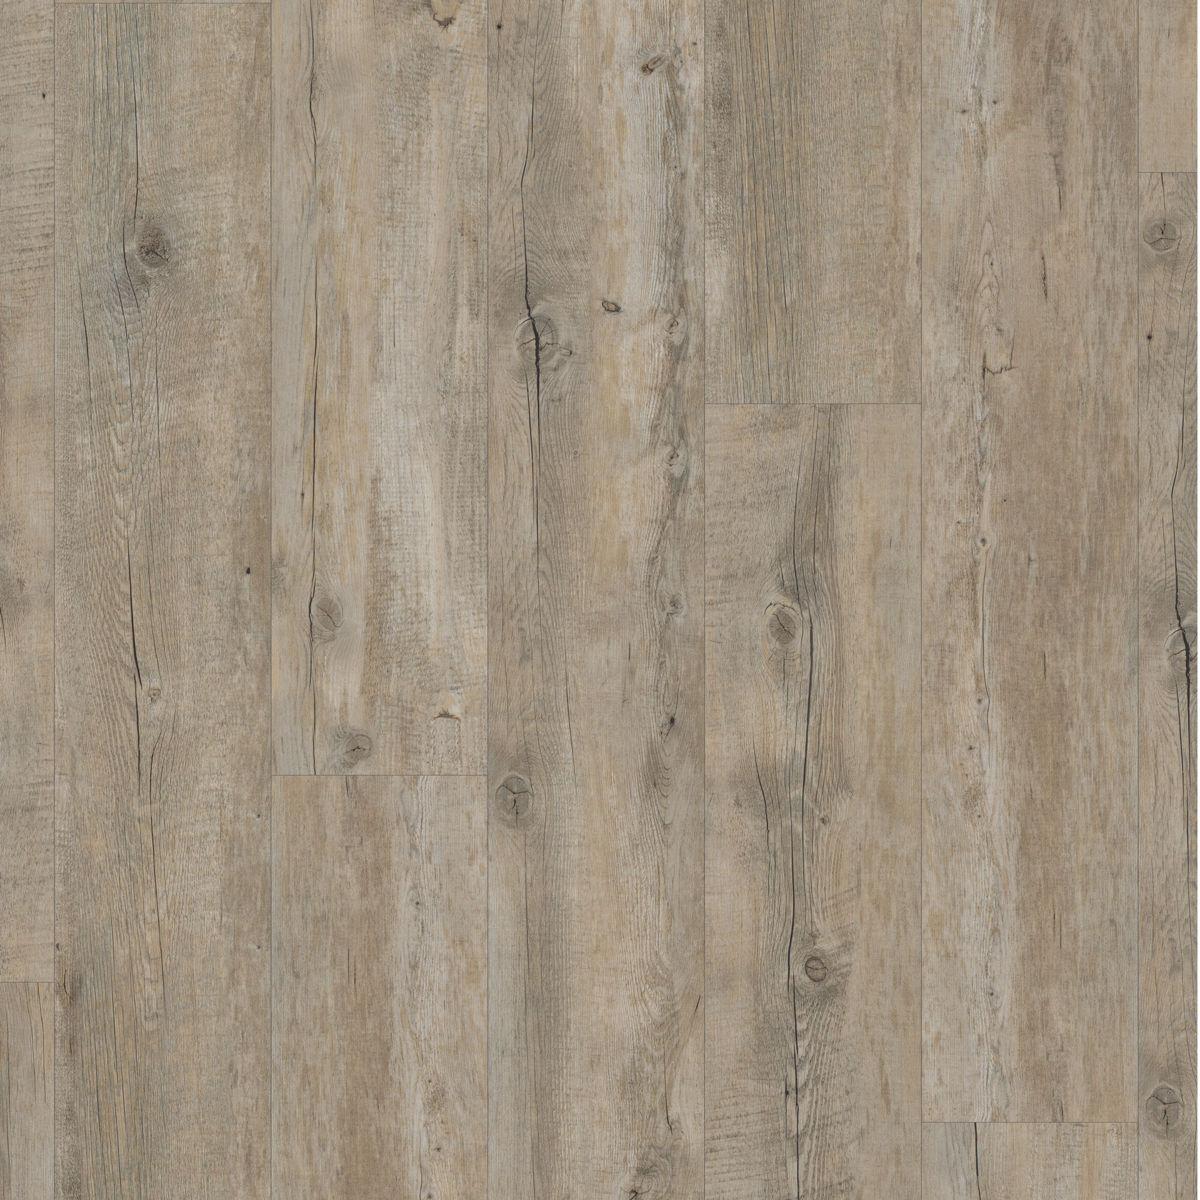 Karndean Van Gogh Distressed Oak Vgw82t Vinyl Flooring